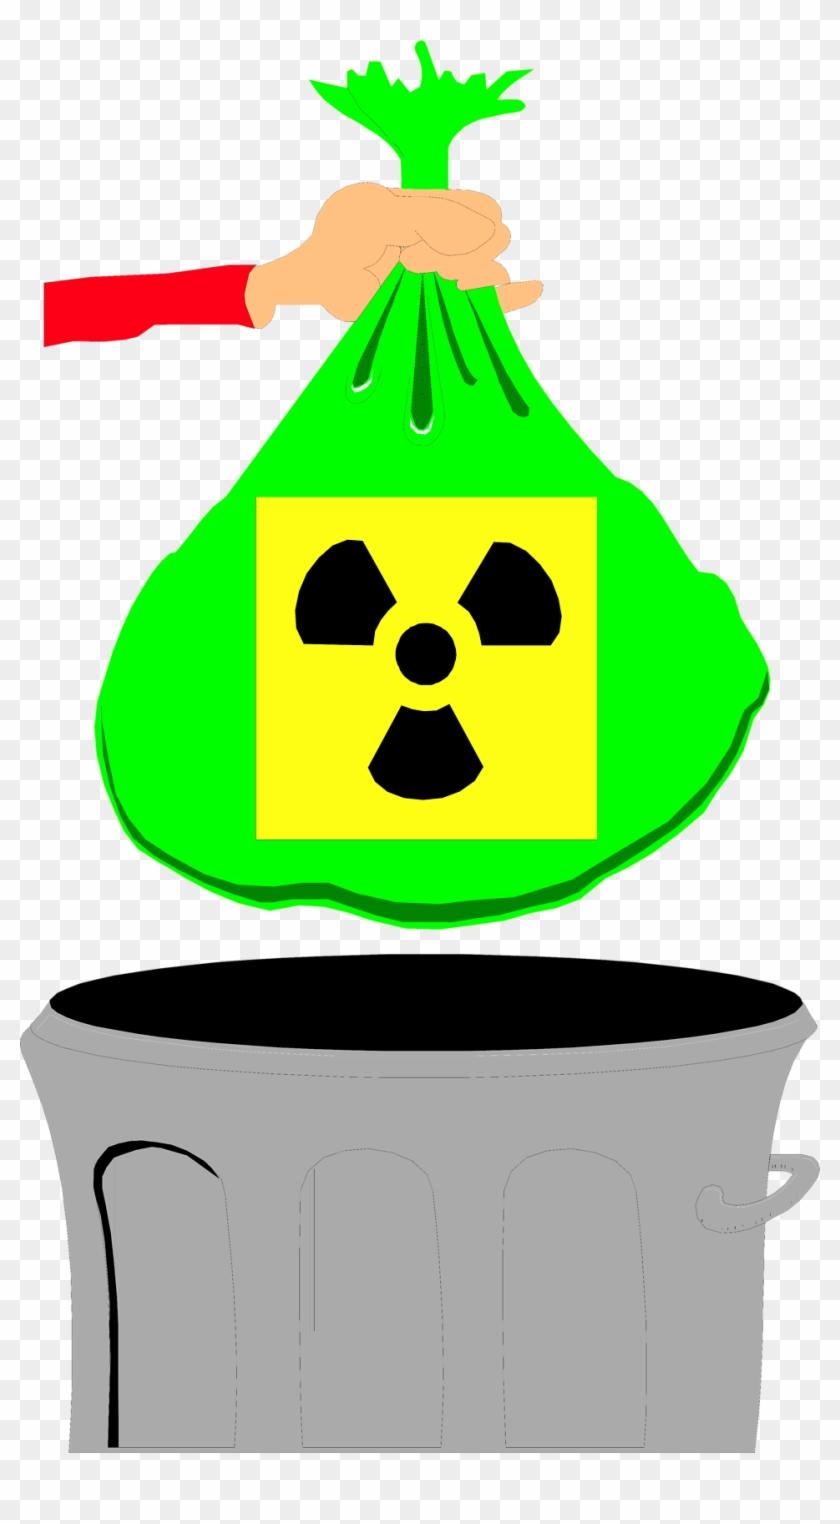 Biohazard Symbol Clipart Infectious Waste - Clip Art Hazardous Waste - Png Download #266517